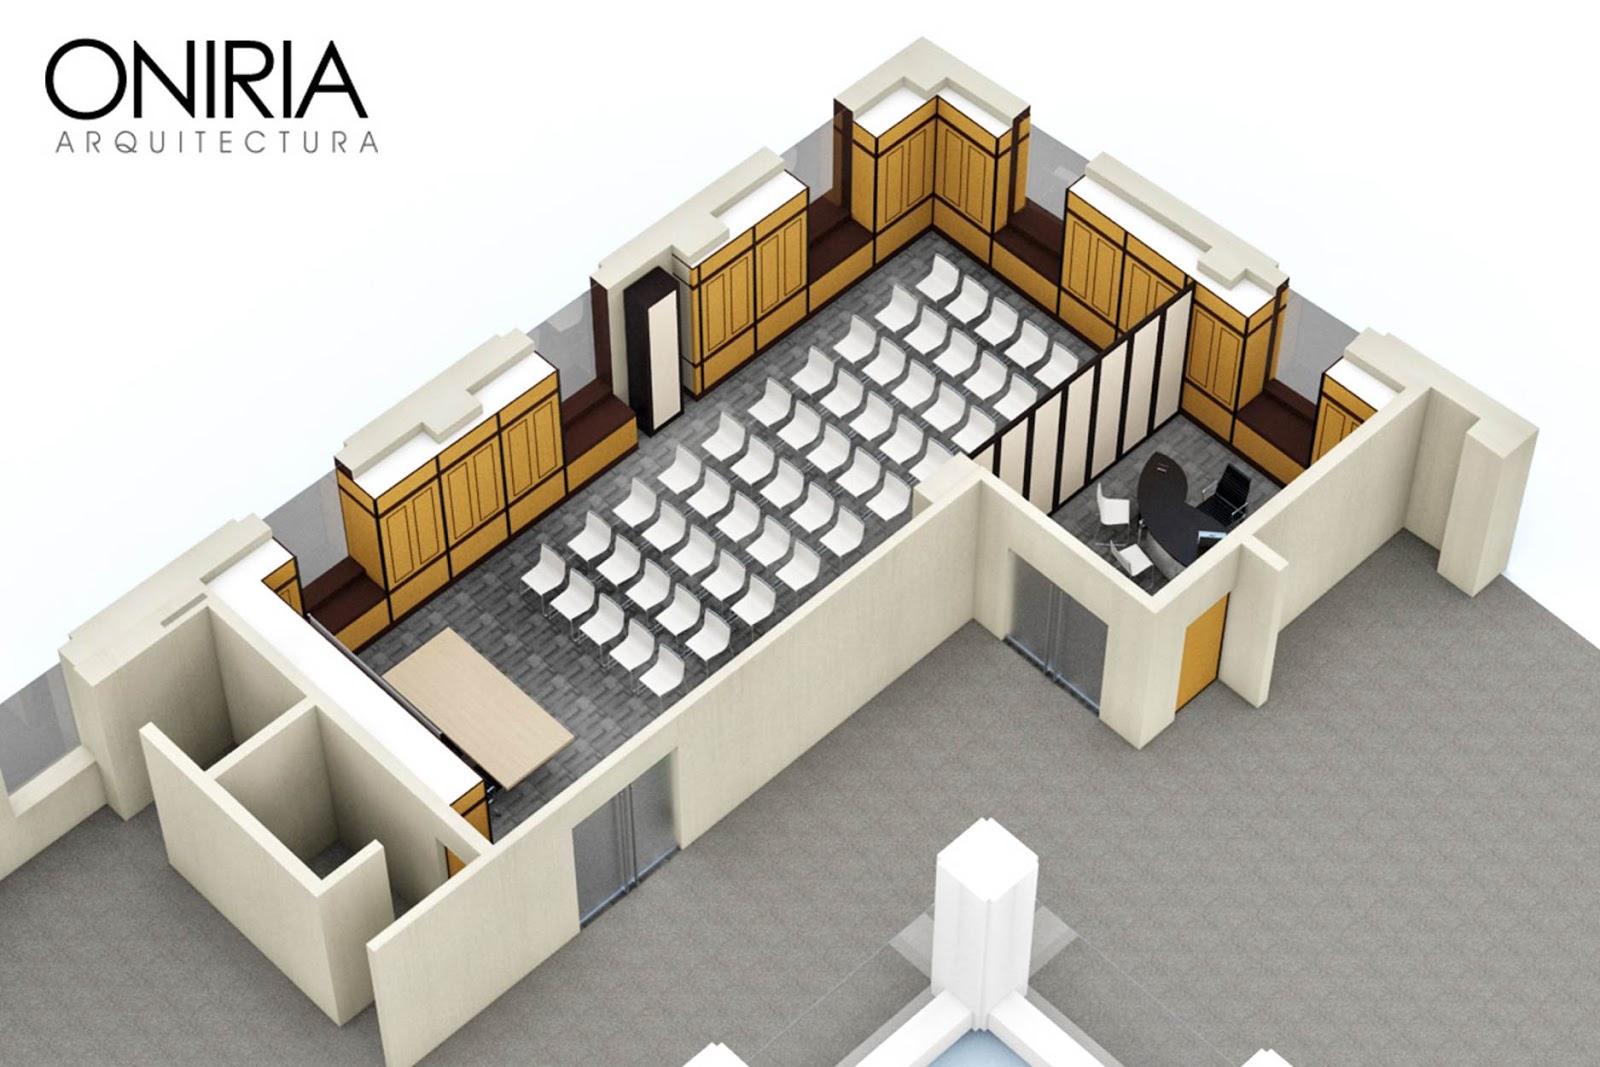 Oniria for Salon de usos multiples programa arquitectonico